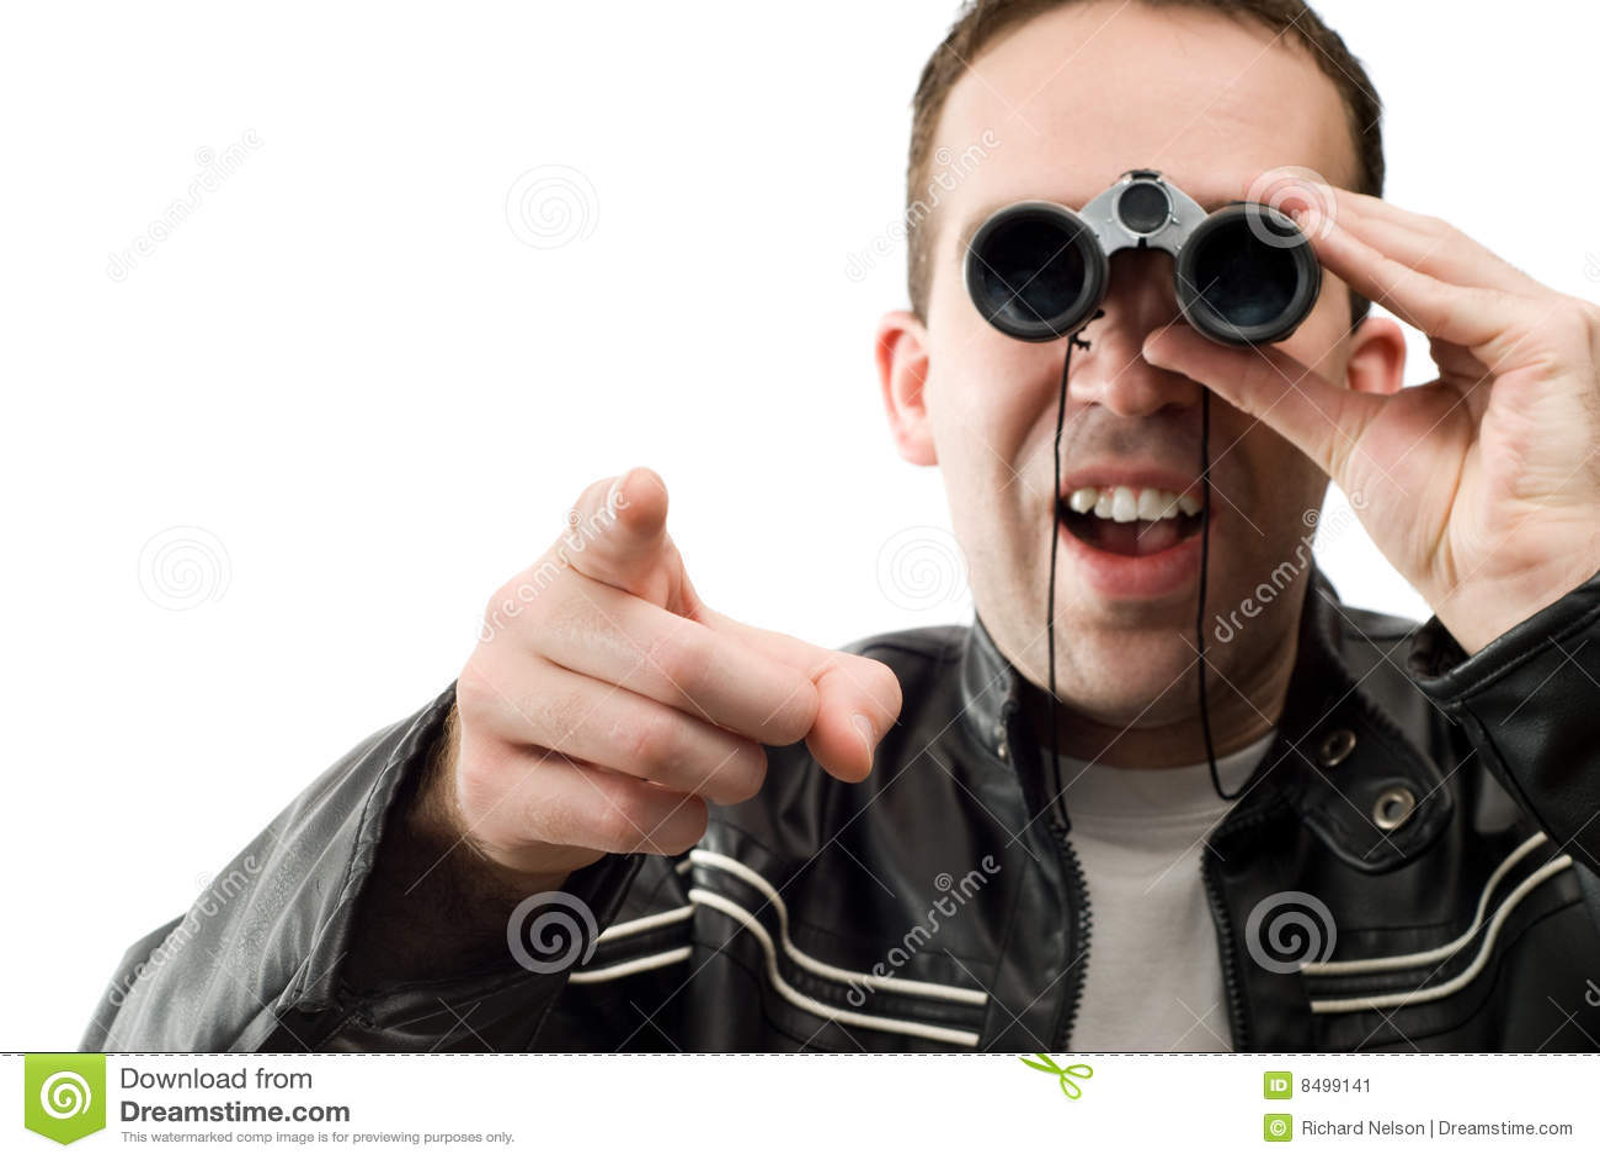 Man Watching With Binoculars Stock Image